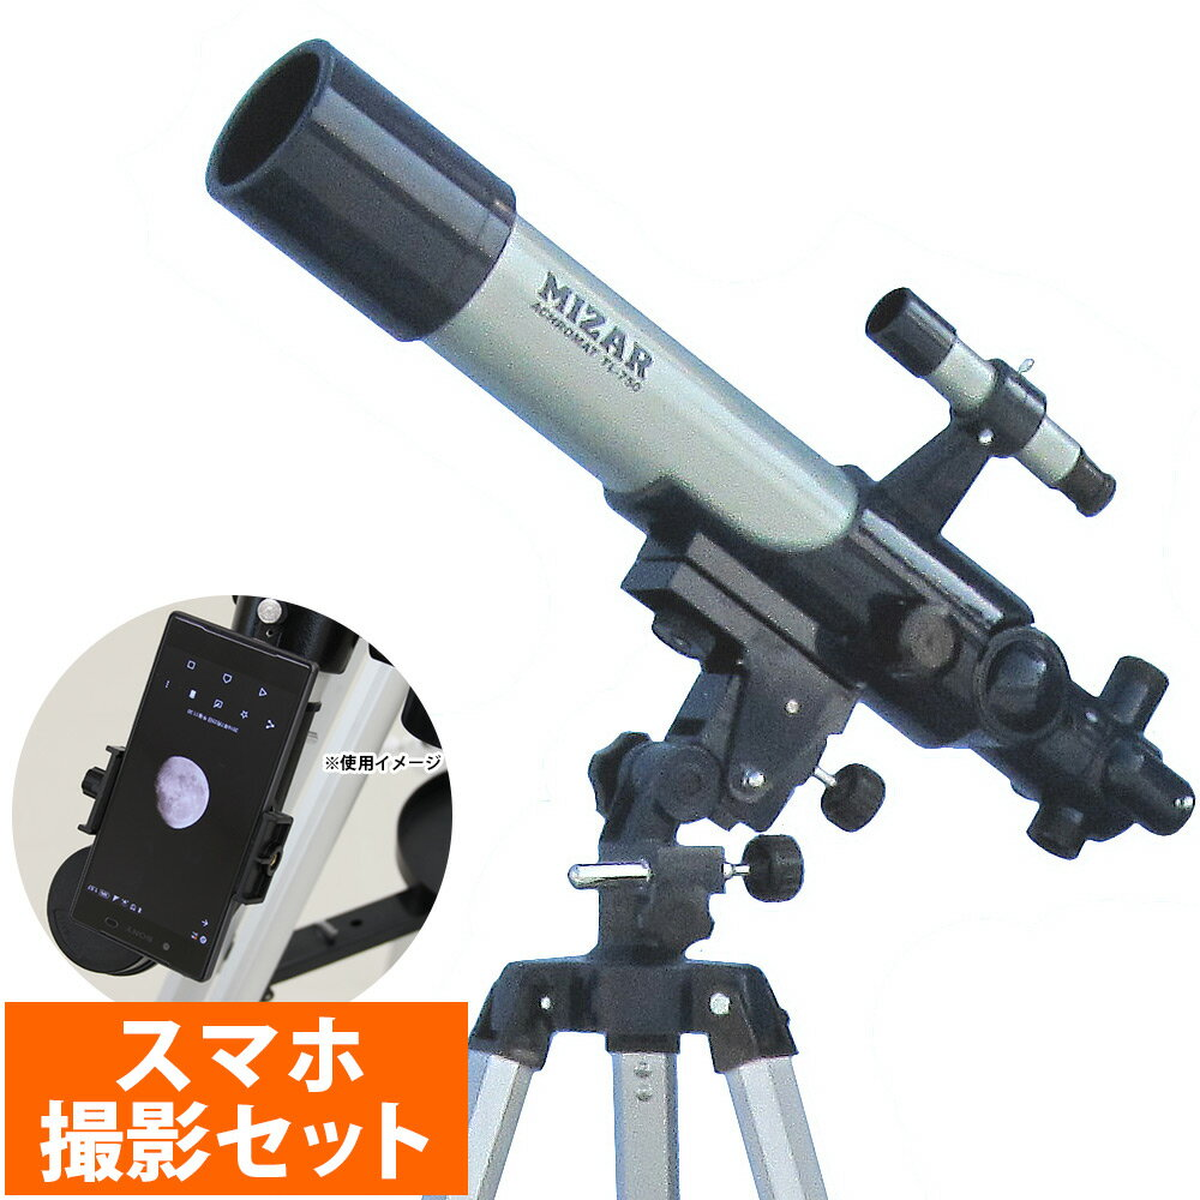 天体望遠鏡 子供 初心者 小学生 スマホ撮影セット TL-750 屈折式 20倍-250倍 入学祝い